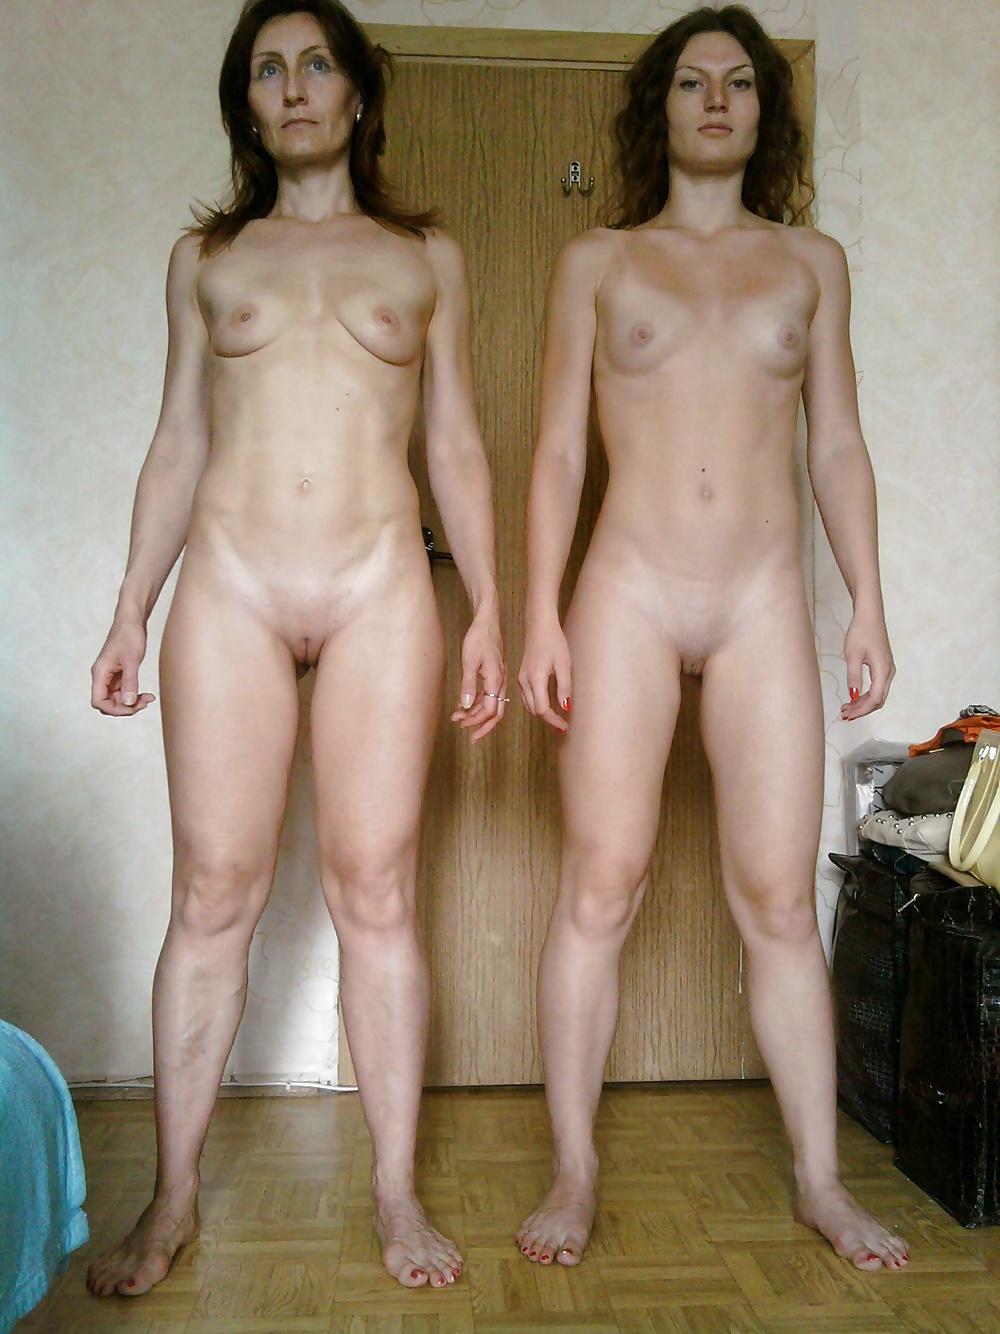 Taylor ashley nude